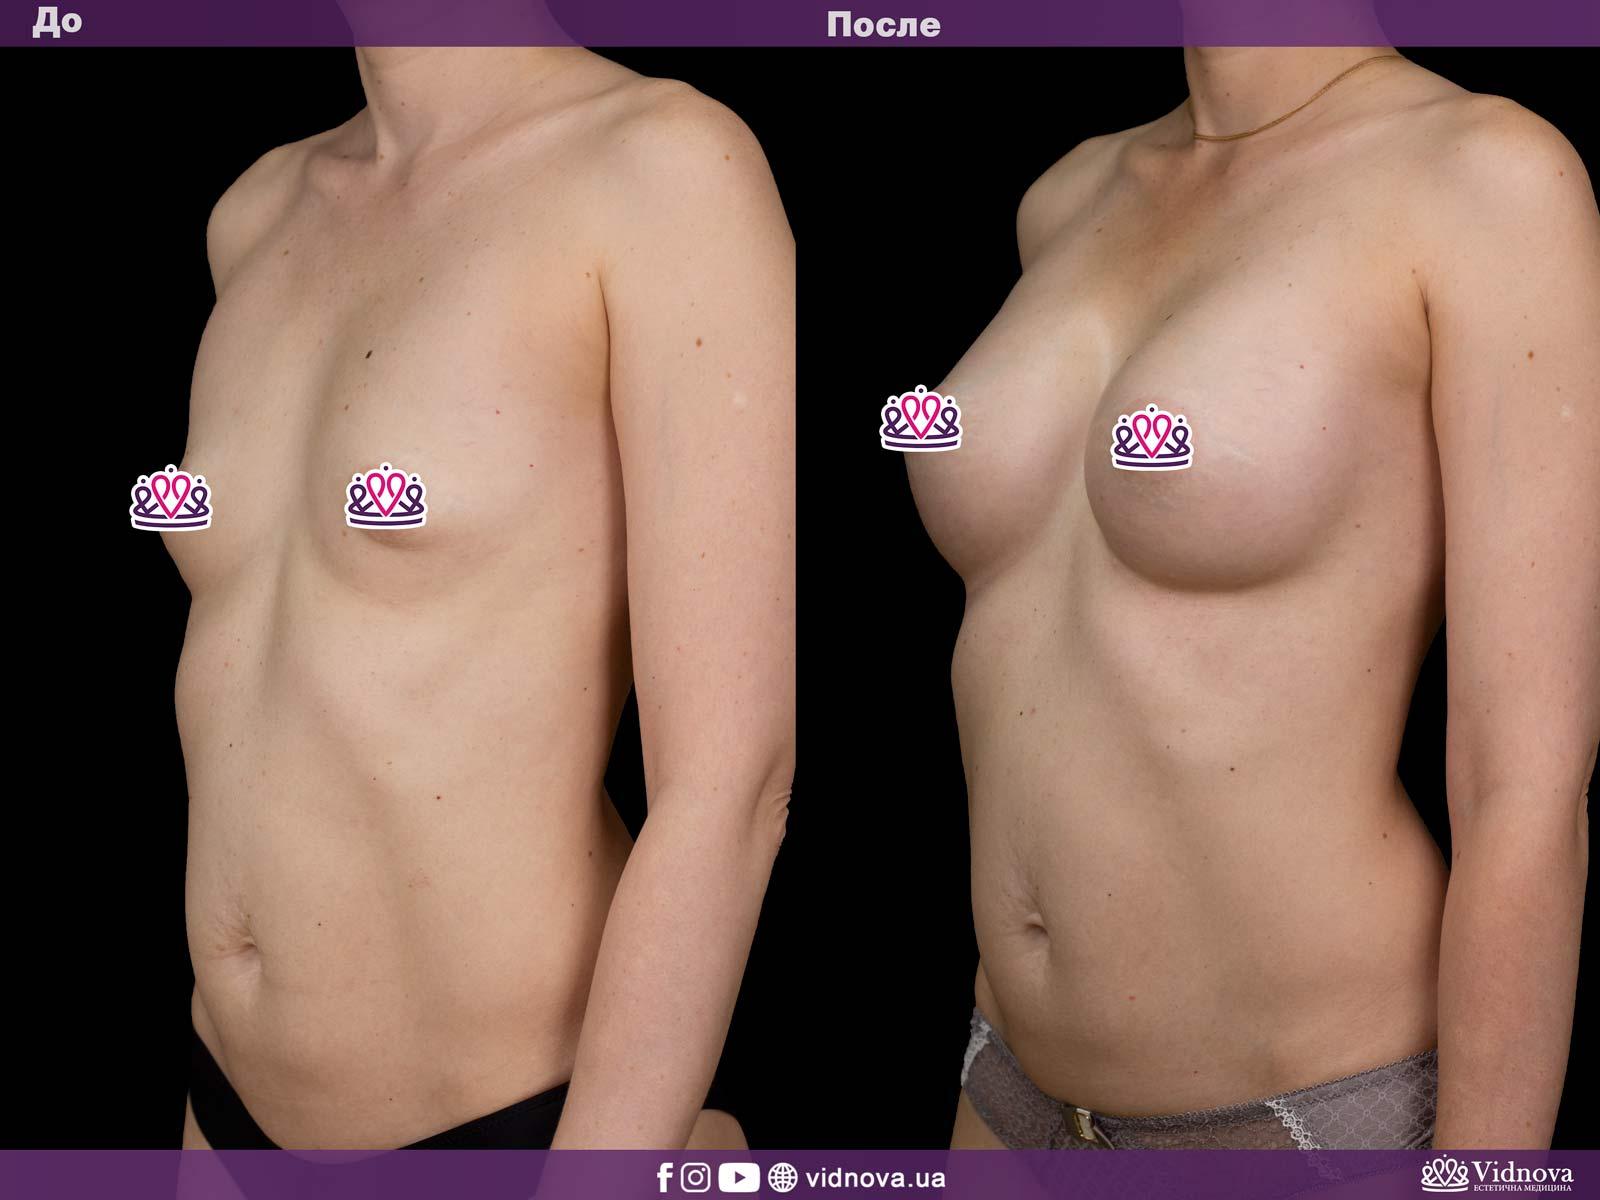 Увеличение груди: Фото ДО и ПОСЛЕ - Пример №24-2 - Клиника Vidnova